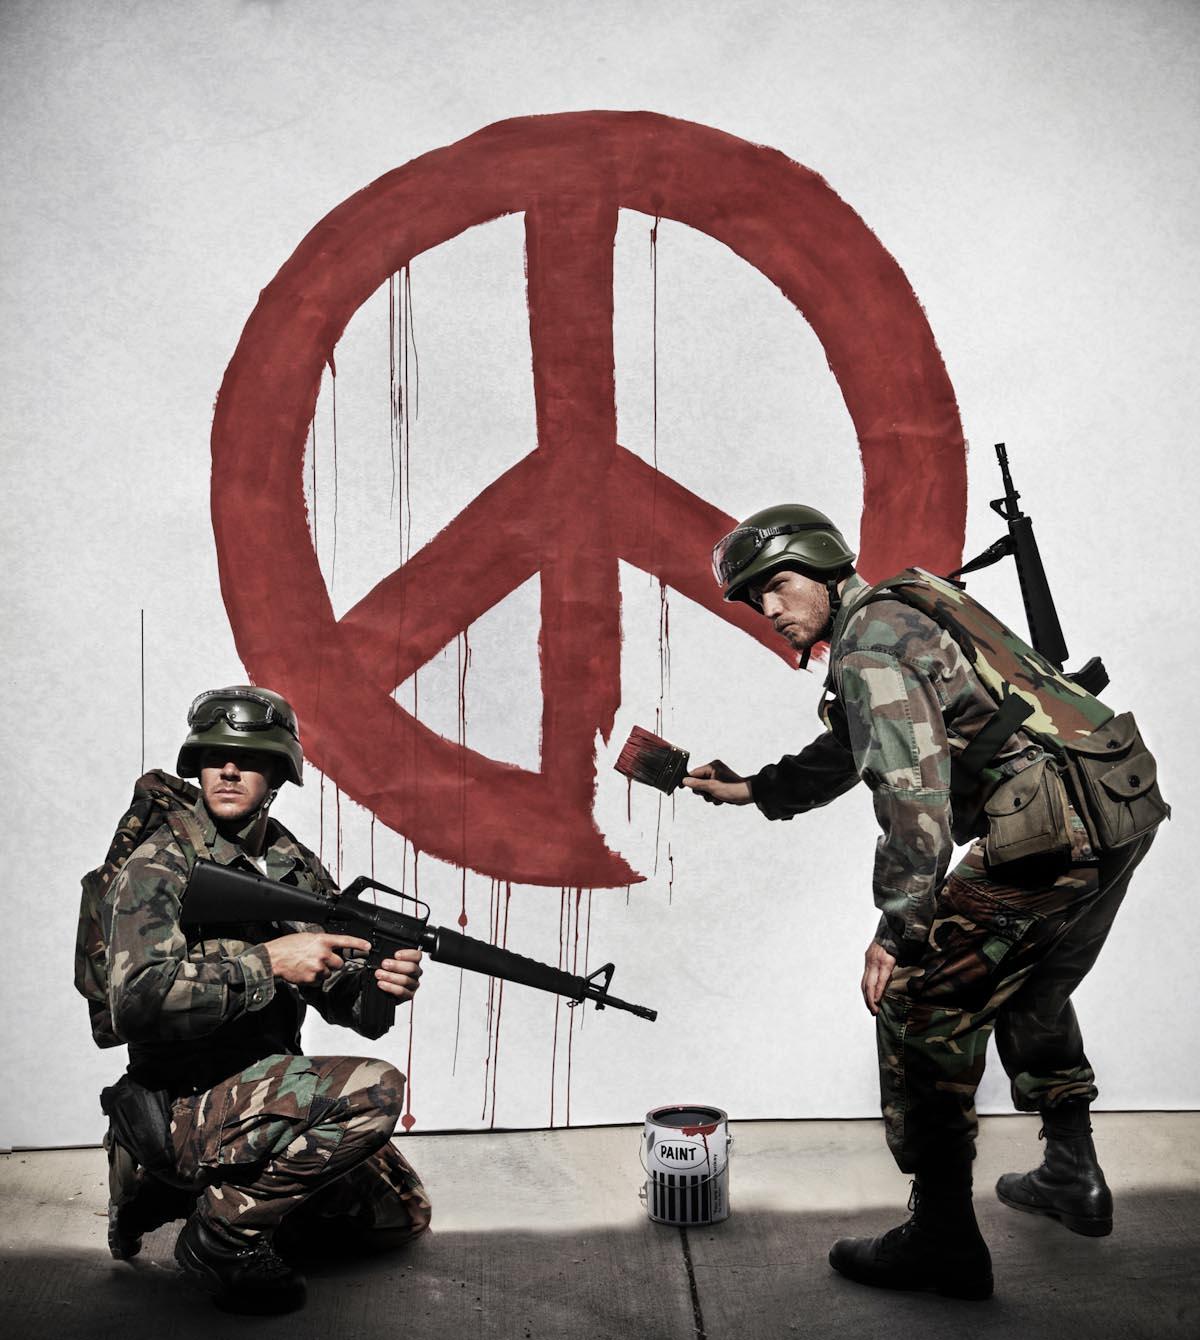 Gallery: Banksy's Iconic Street Art   Creative Resistance